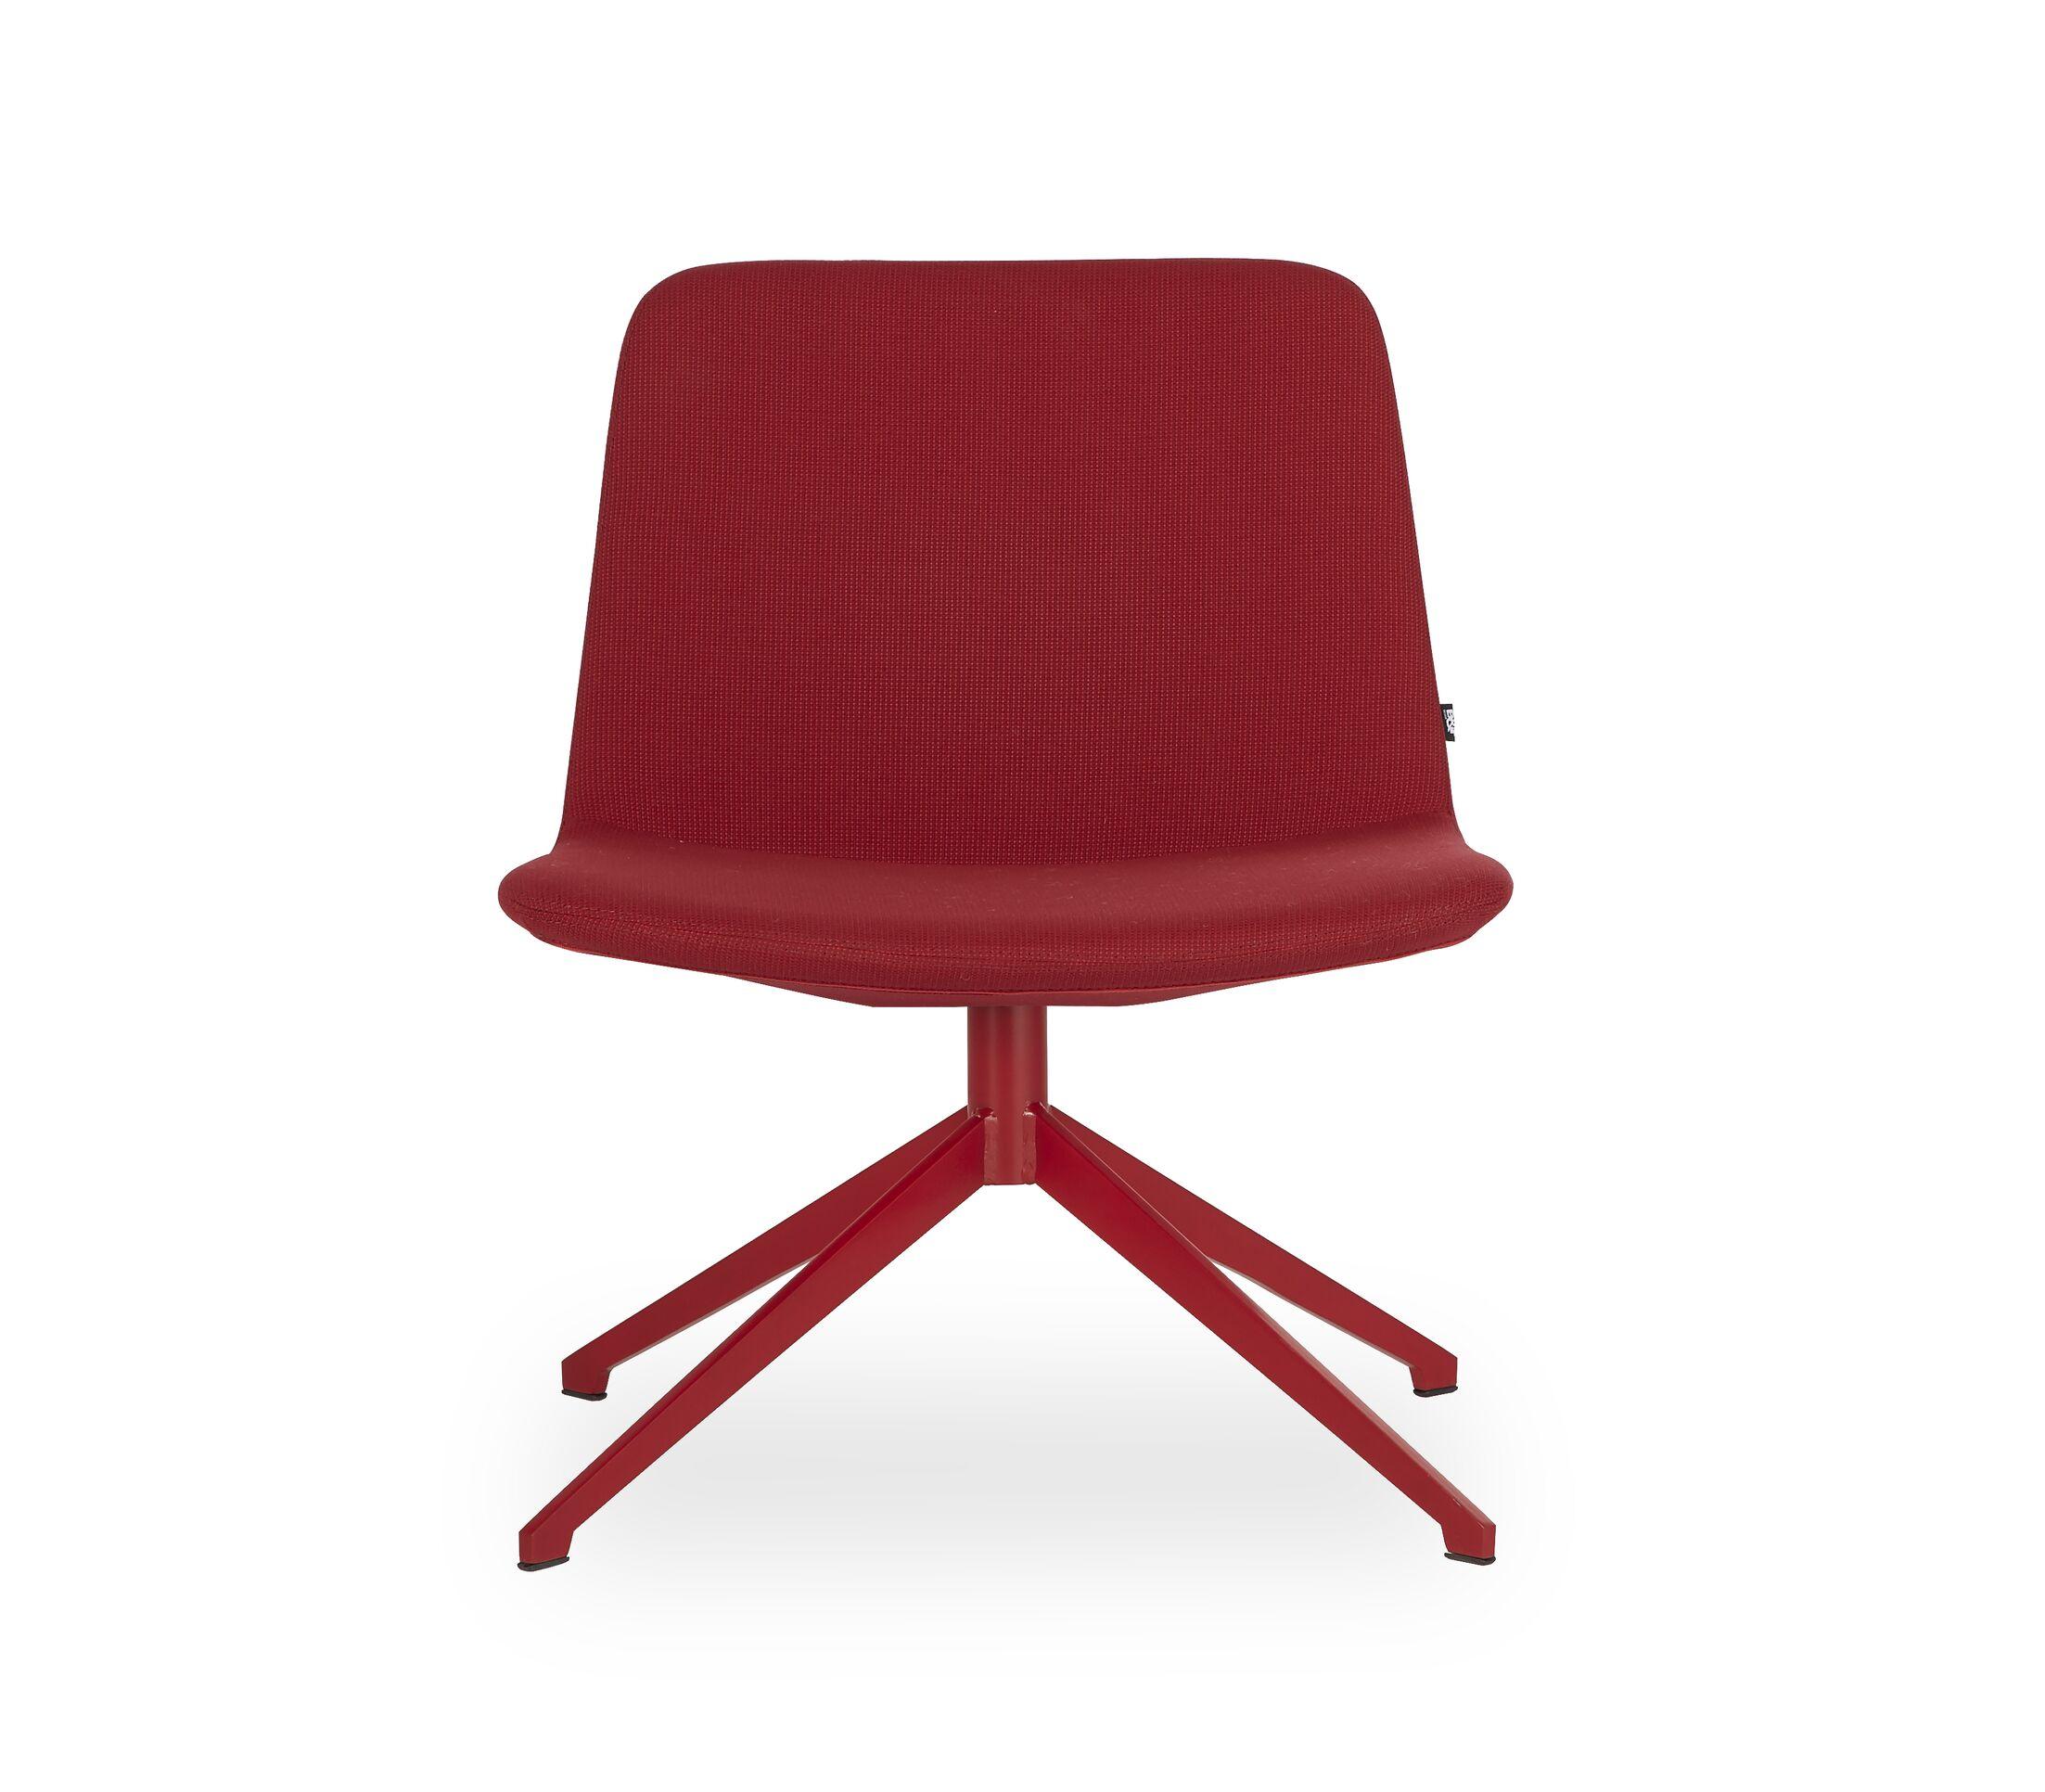 Fechteler Swivel Side Chair Seat Color: Red, Finish: Red